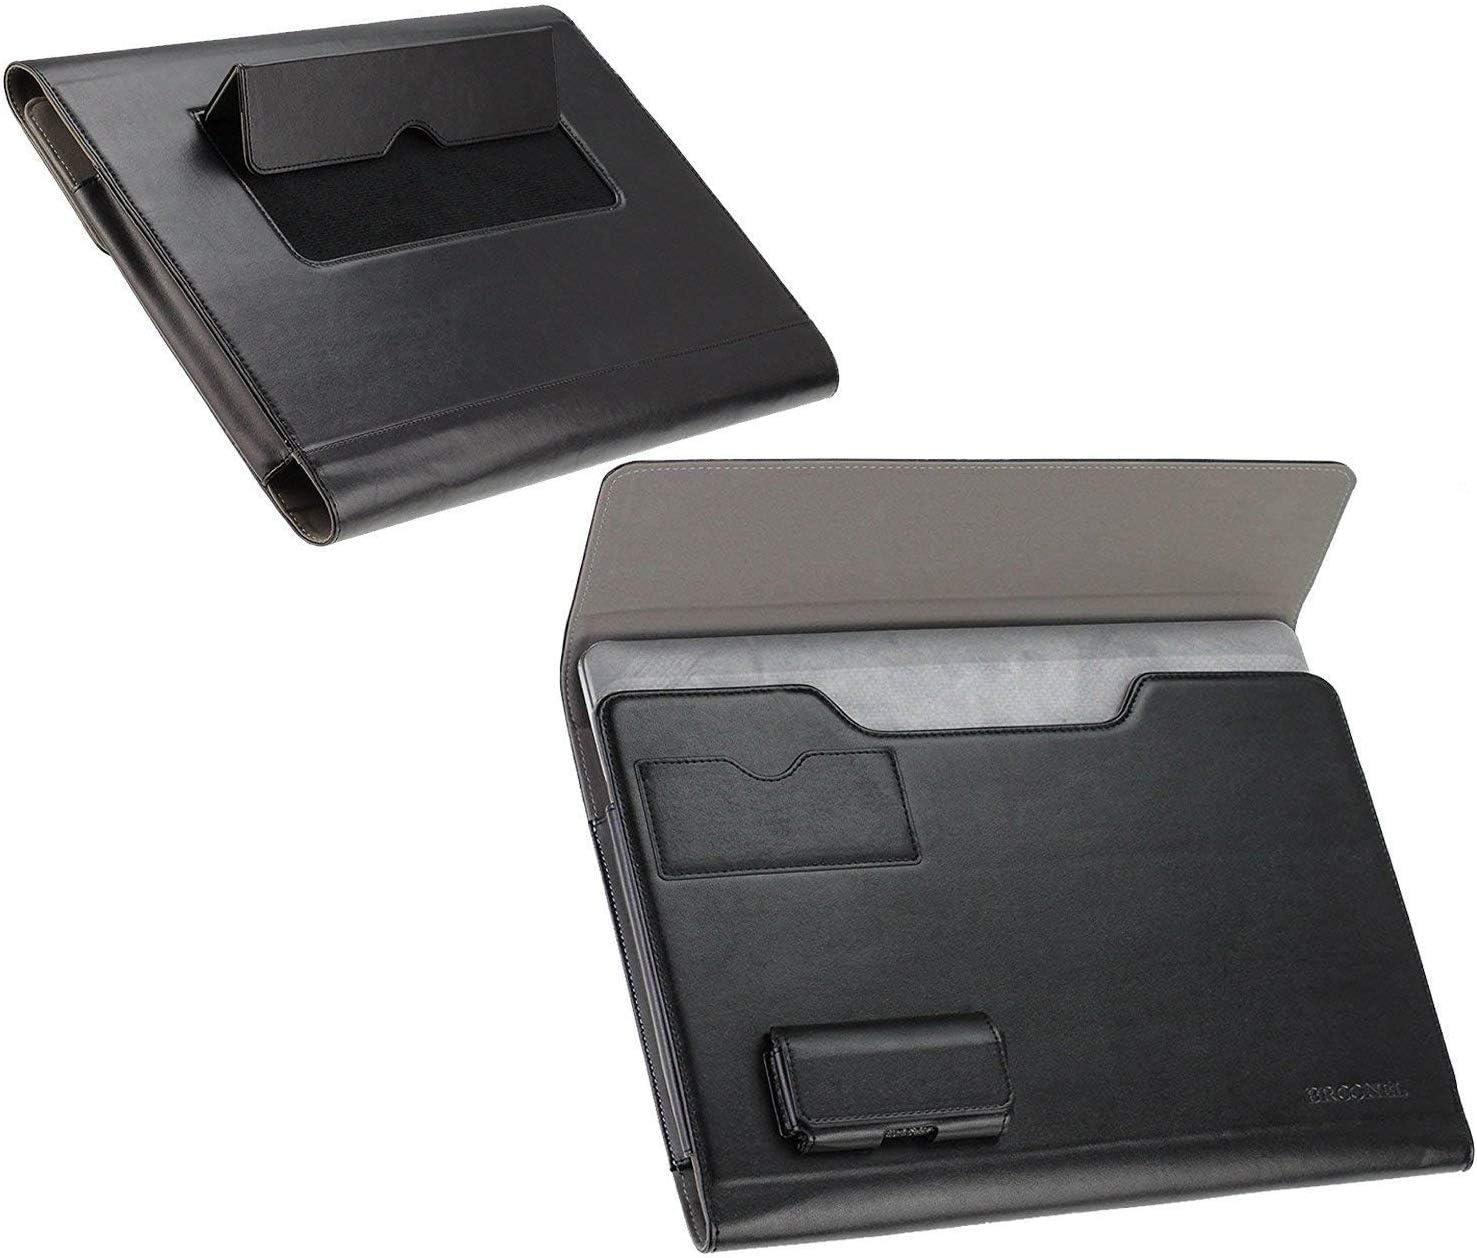 Navitech Sales Broonel - Prestige Black Folio Comp Laptop Case Cover Sale price